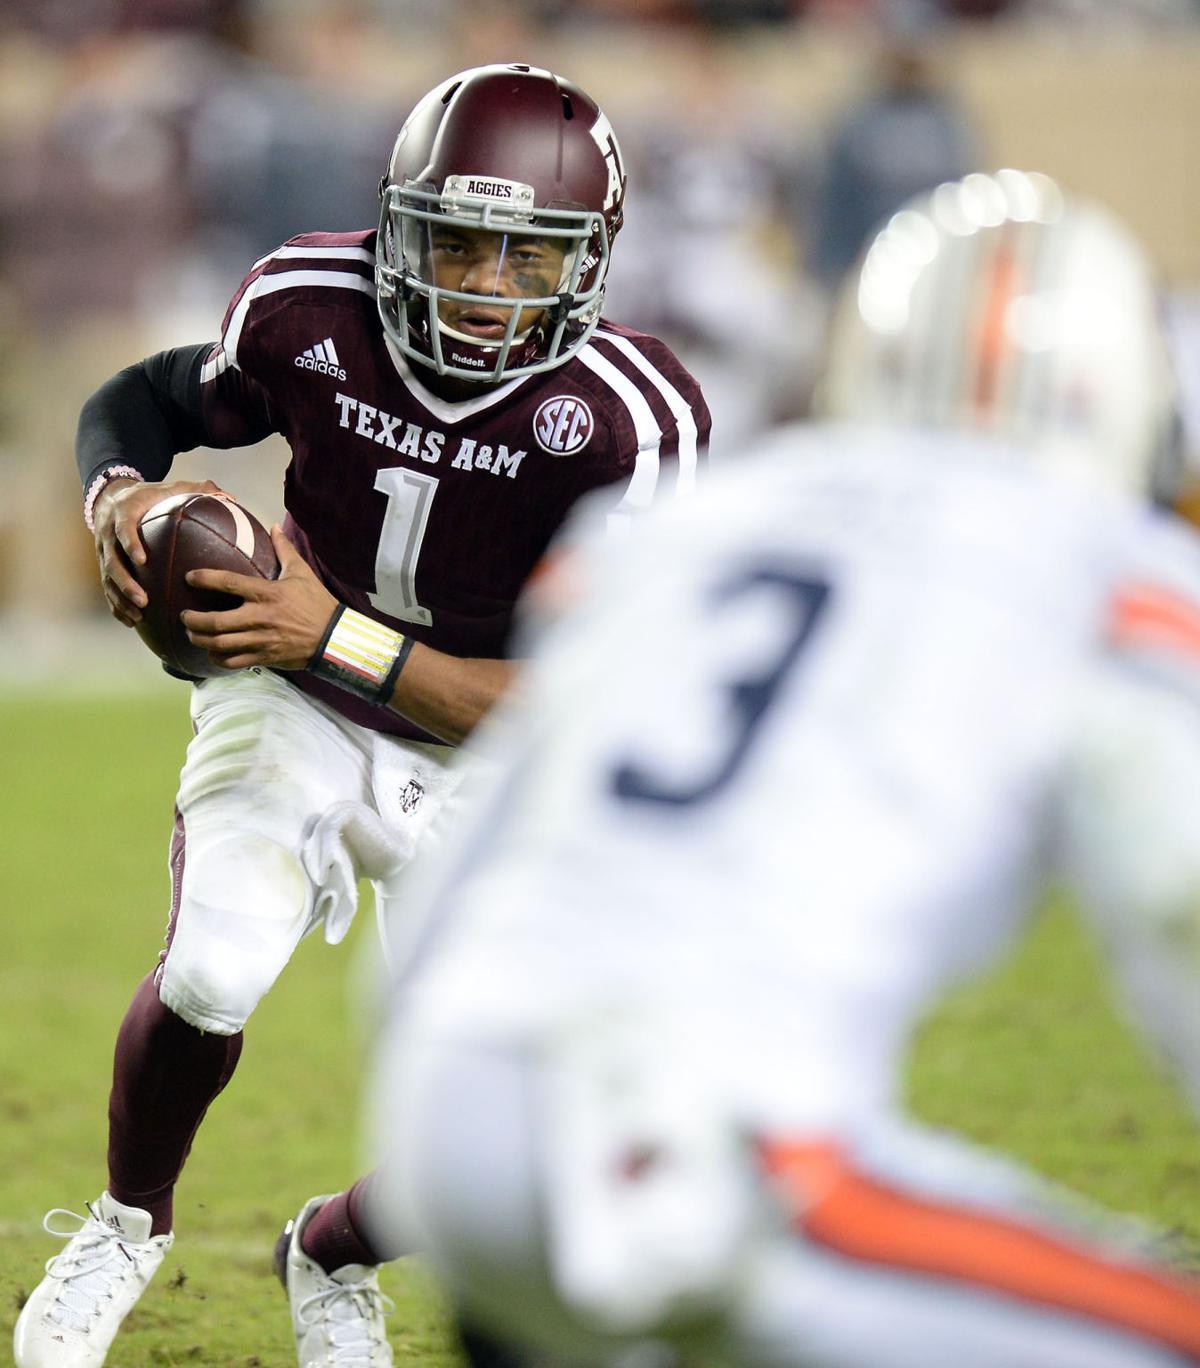 Auburn vs. Texas A&M NCAA College Football